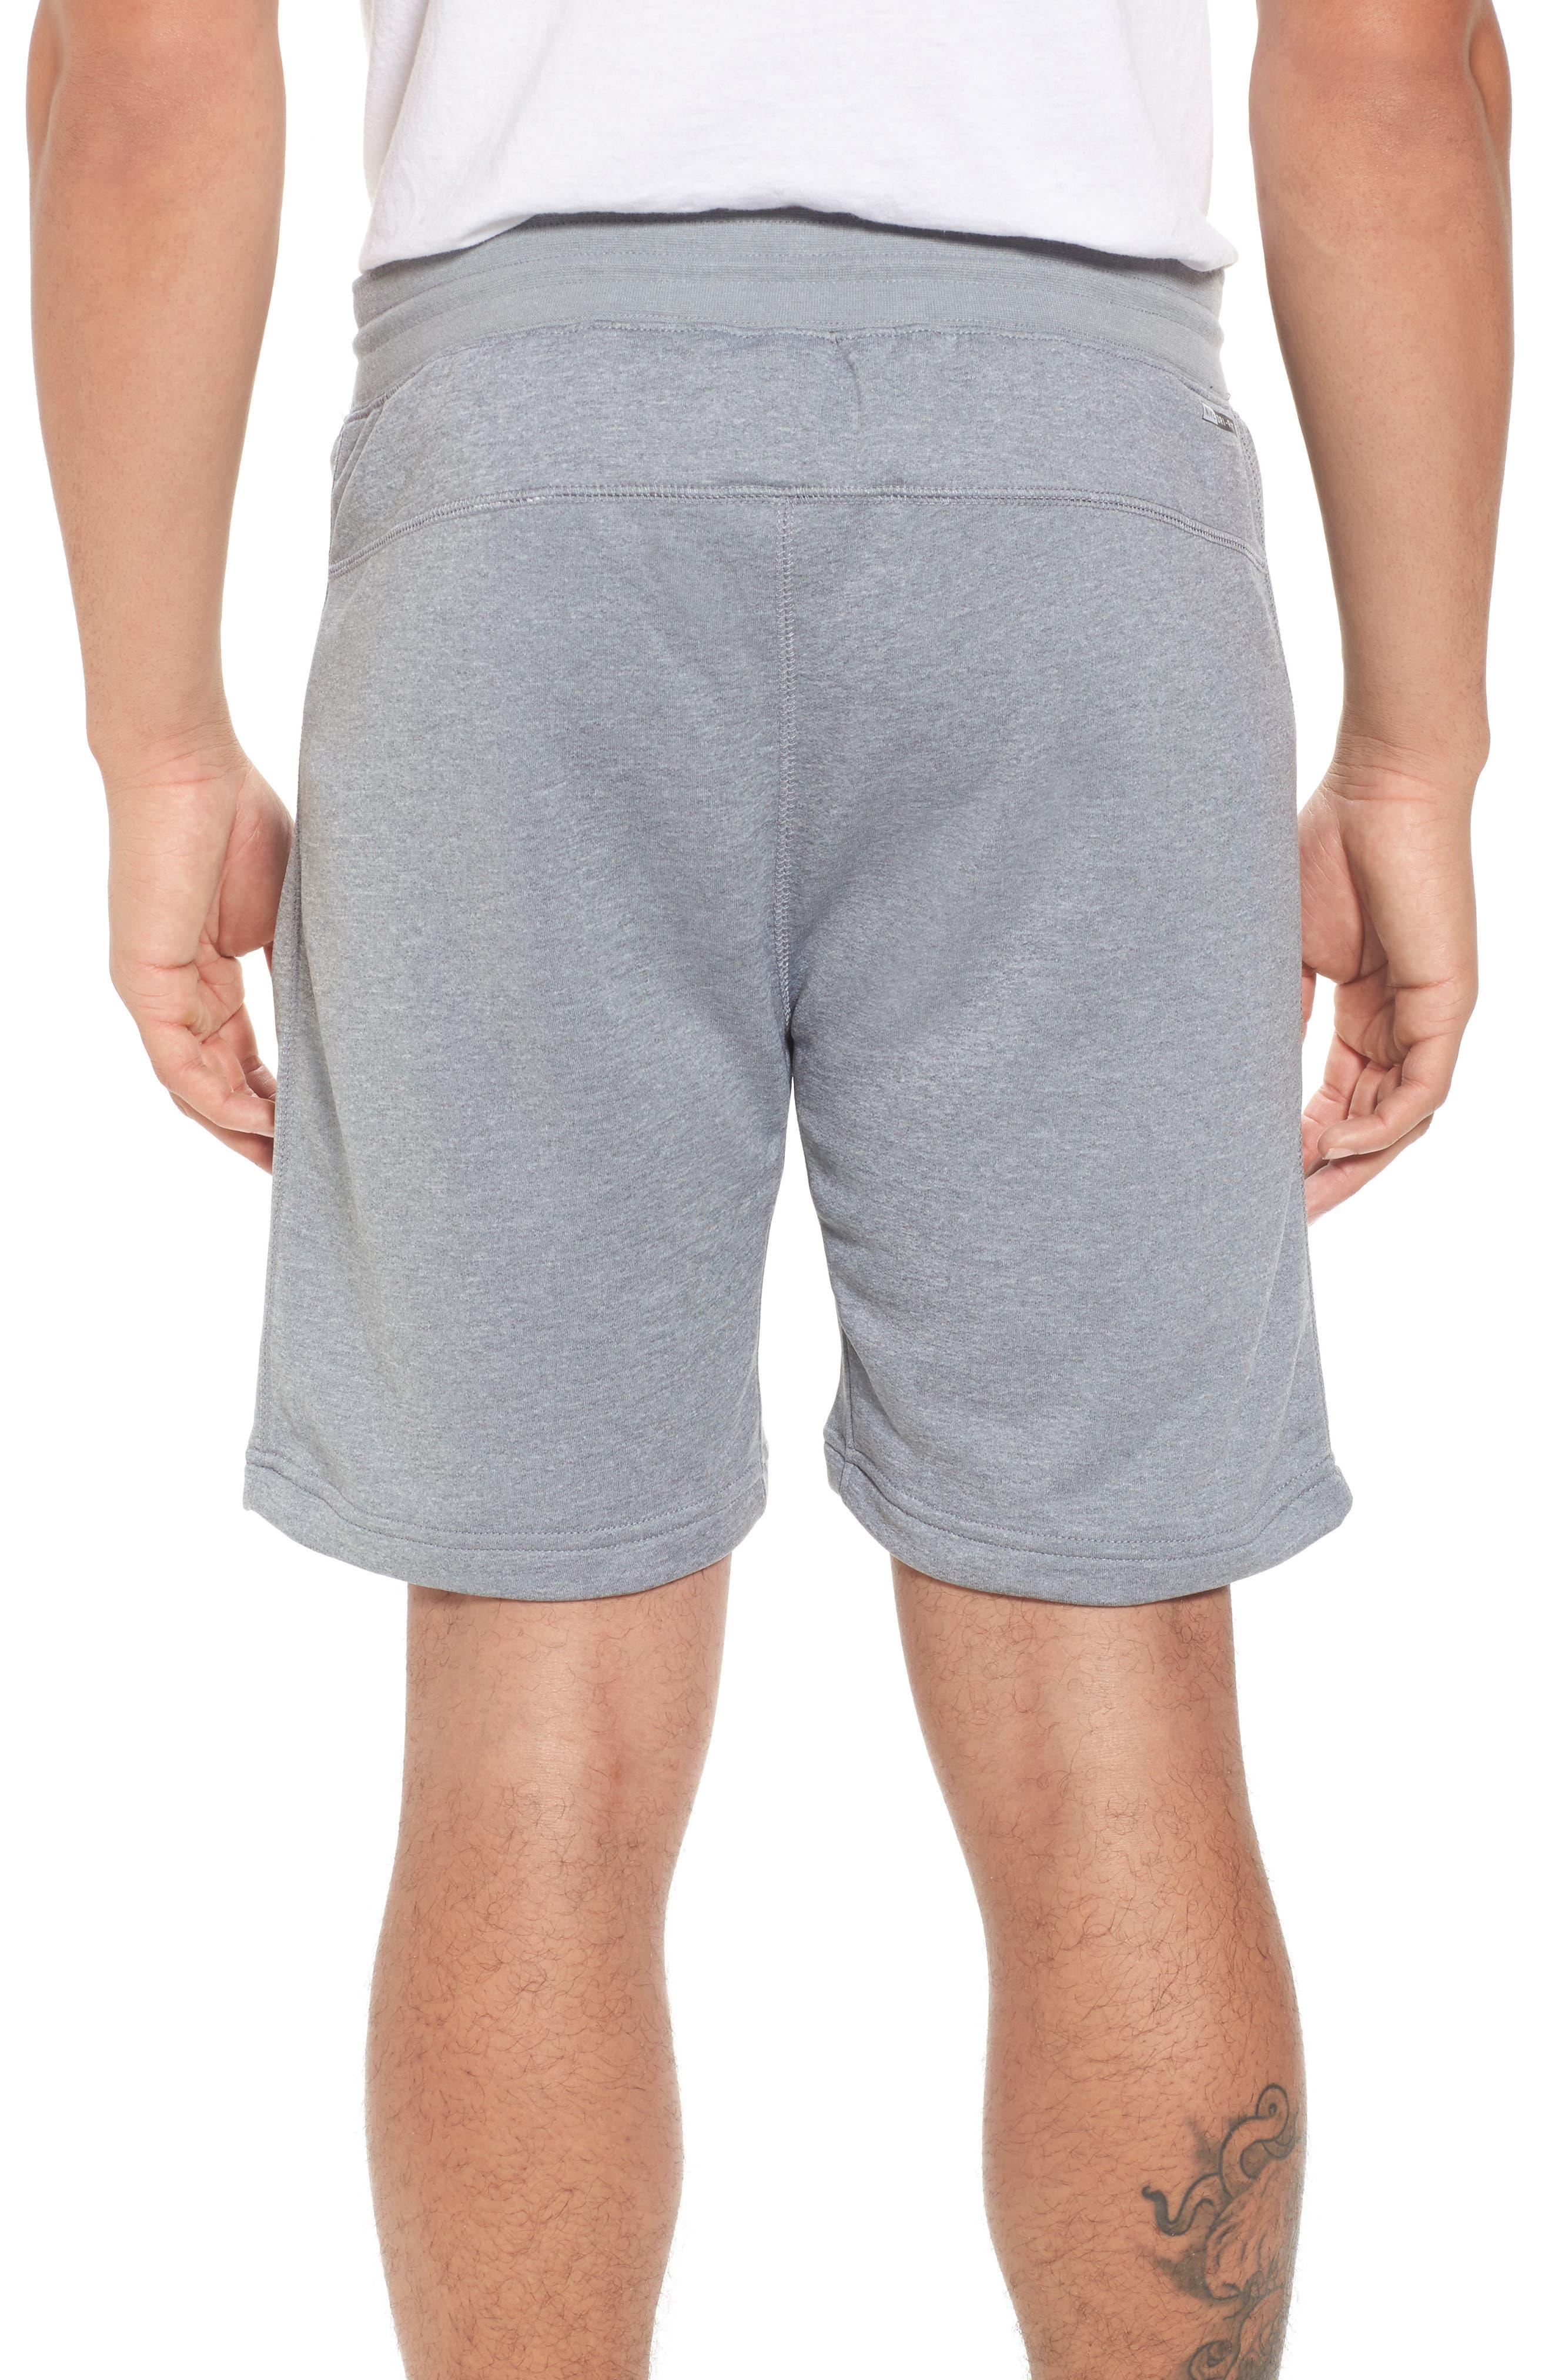 Dri-FIT Solar Shorts,                             Alternate thumbnail 2, color,                             Cool Grey